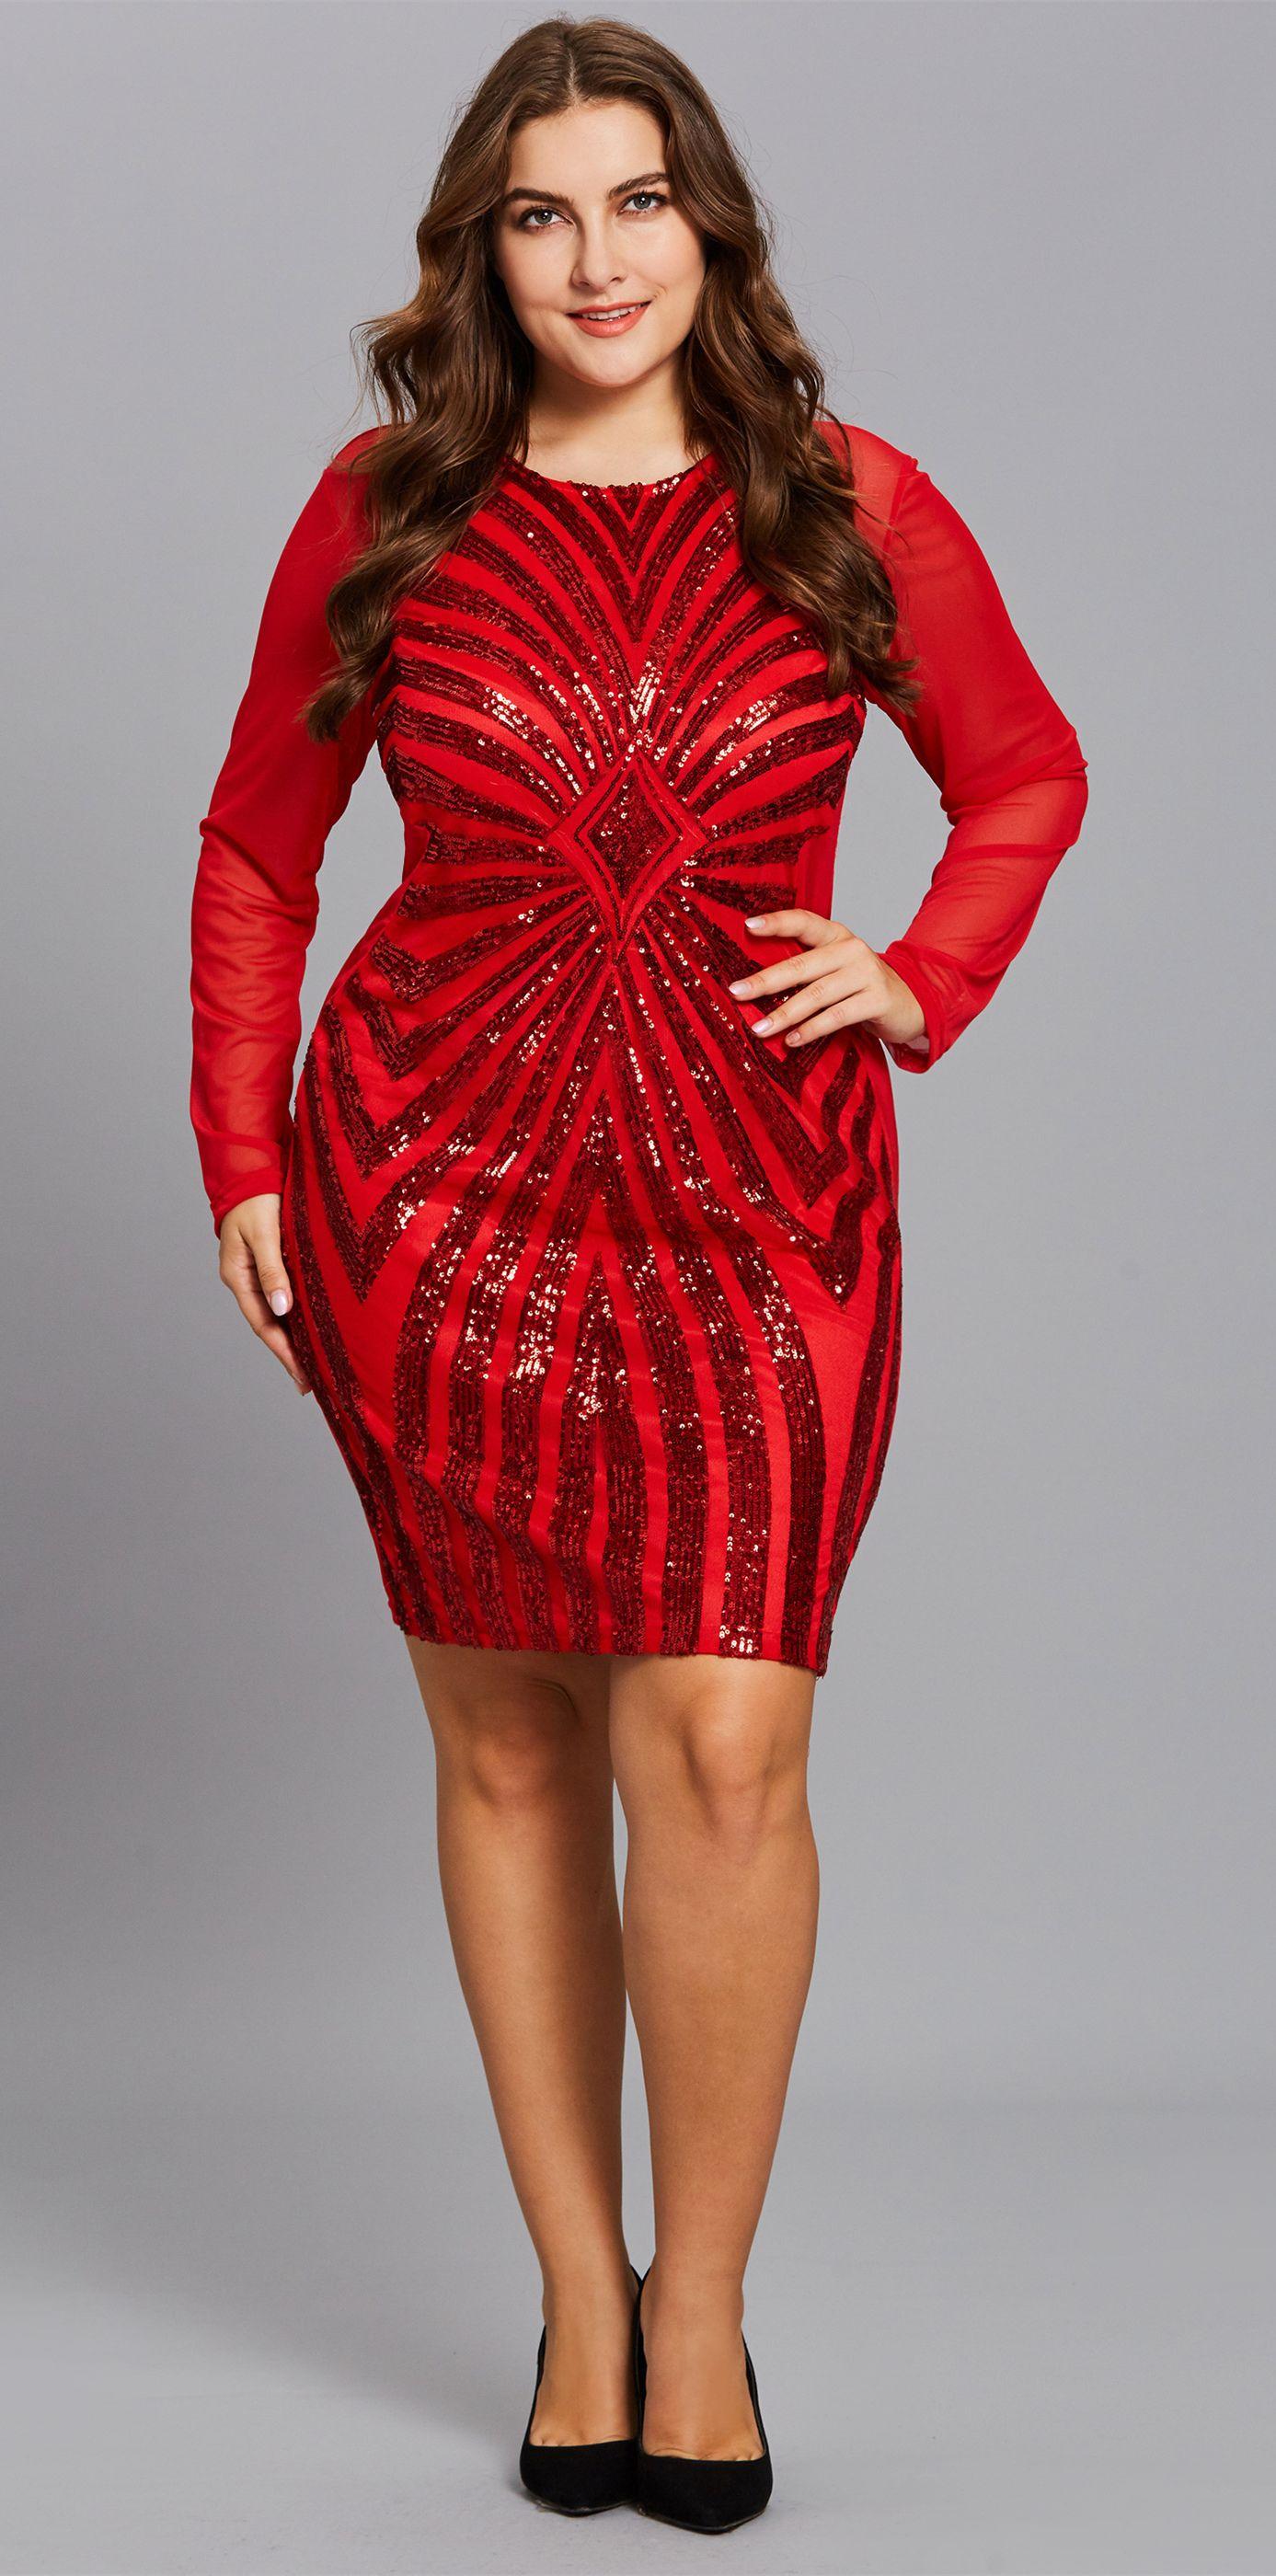 Material Cotton Blends  Silhouette Bodycon  Dress Length Knee-Length  red   dress  reddress  fashion  plussize bc190242d